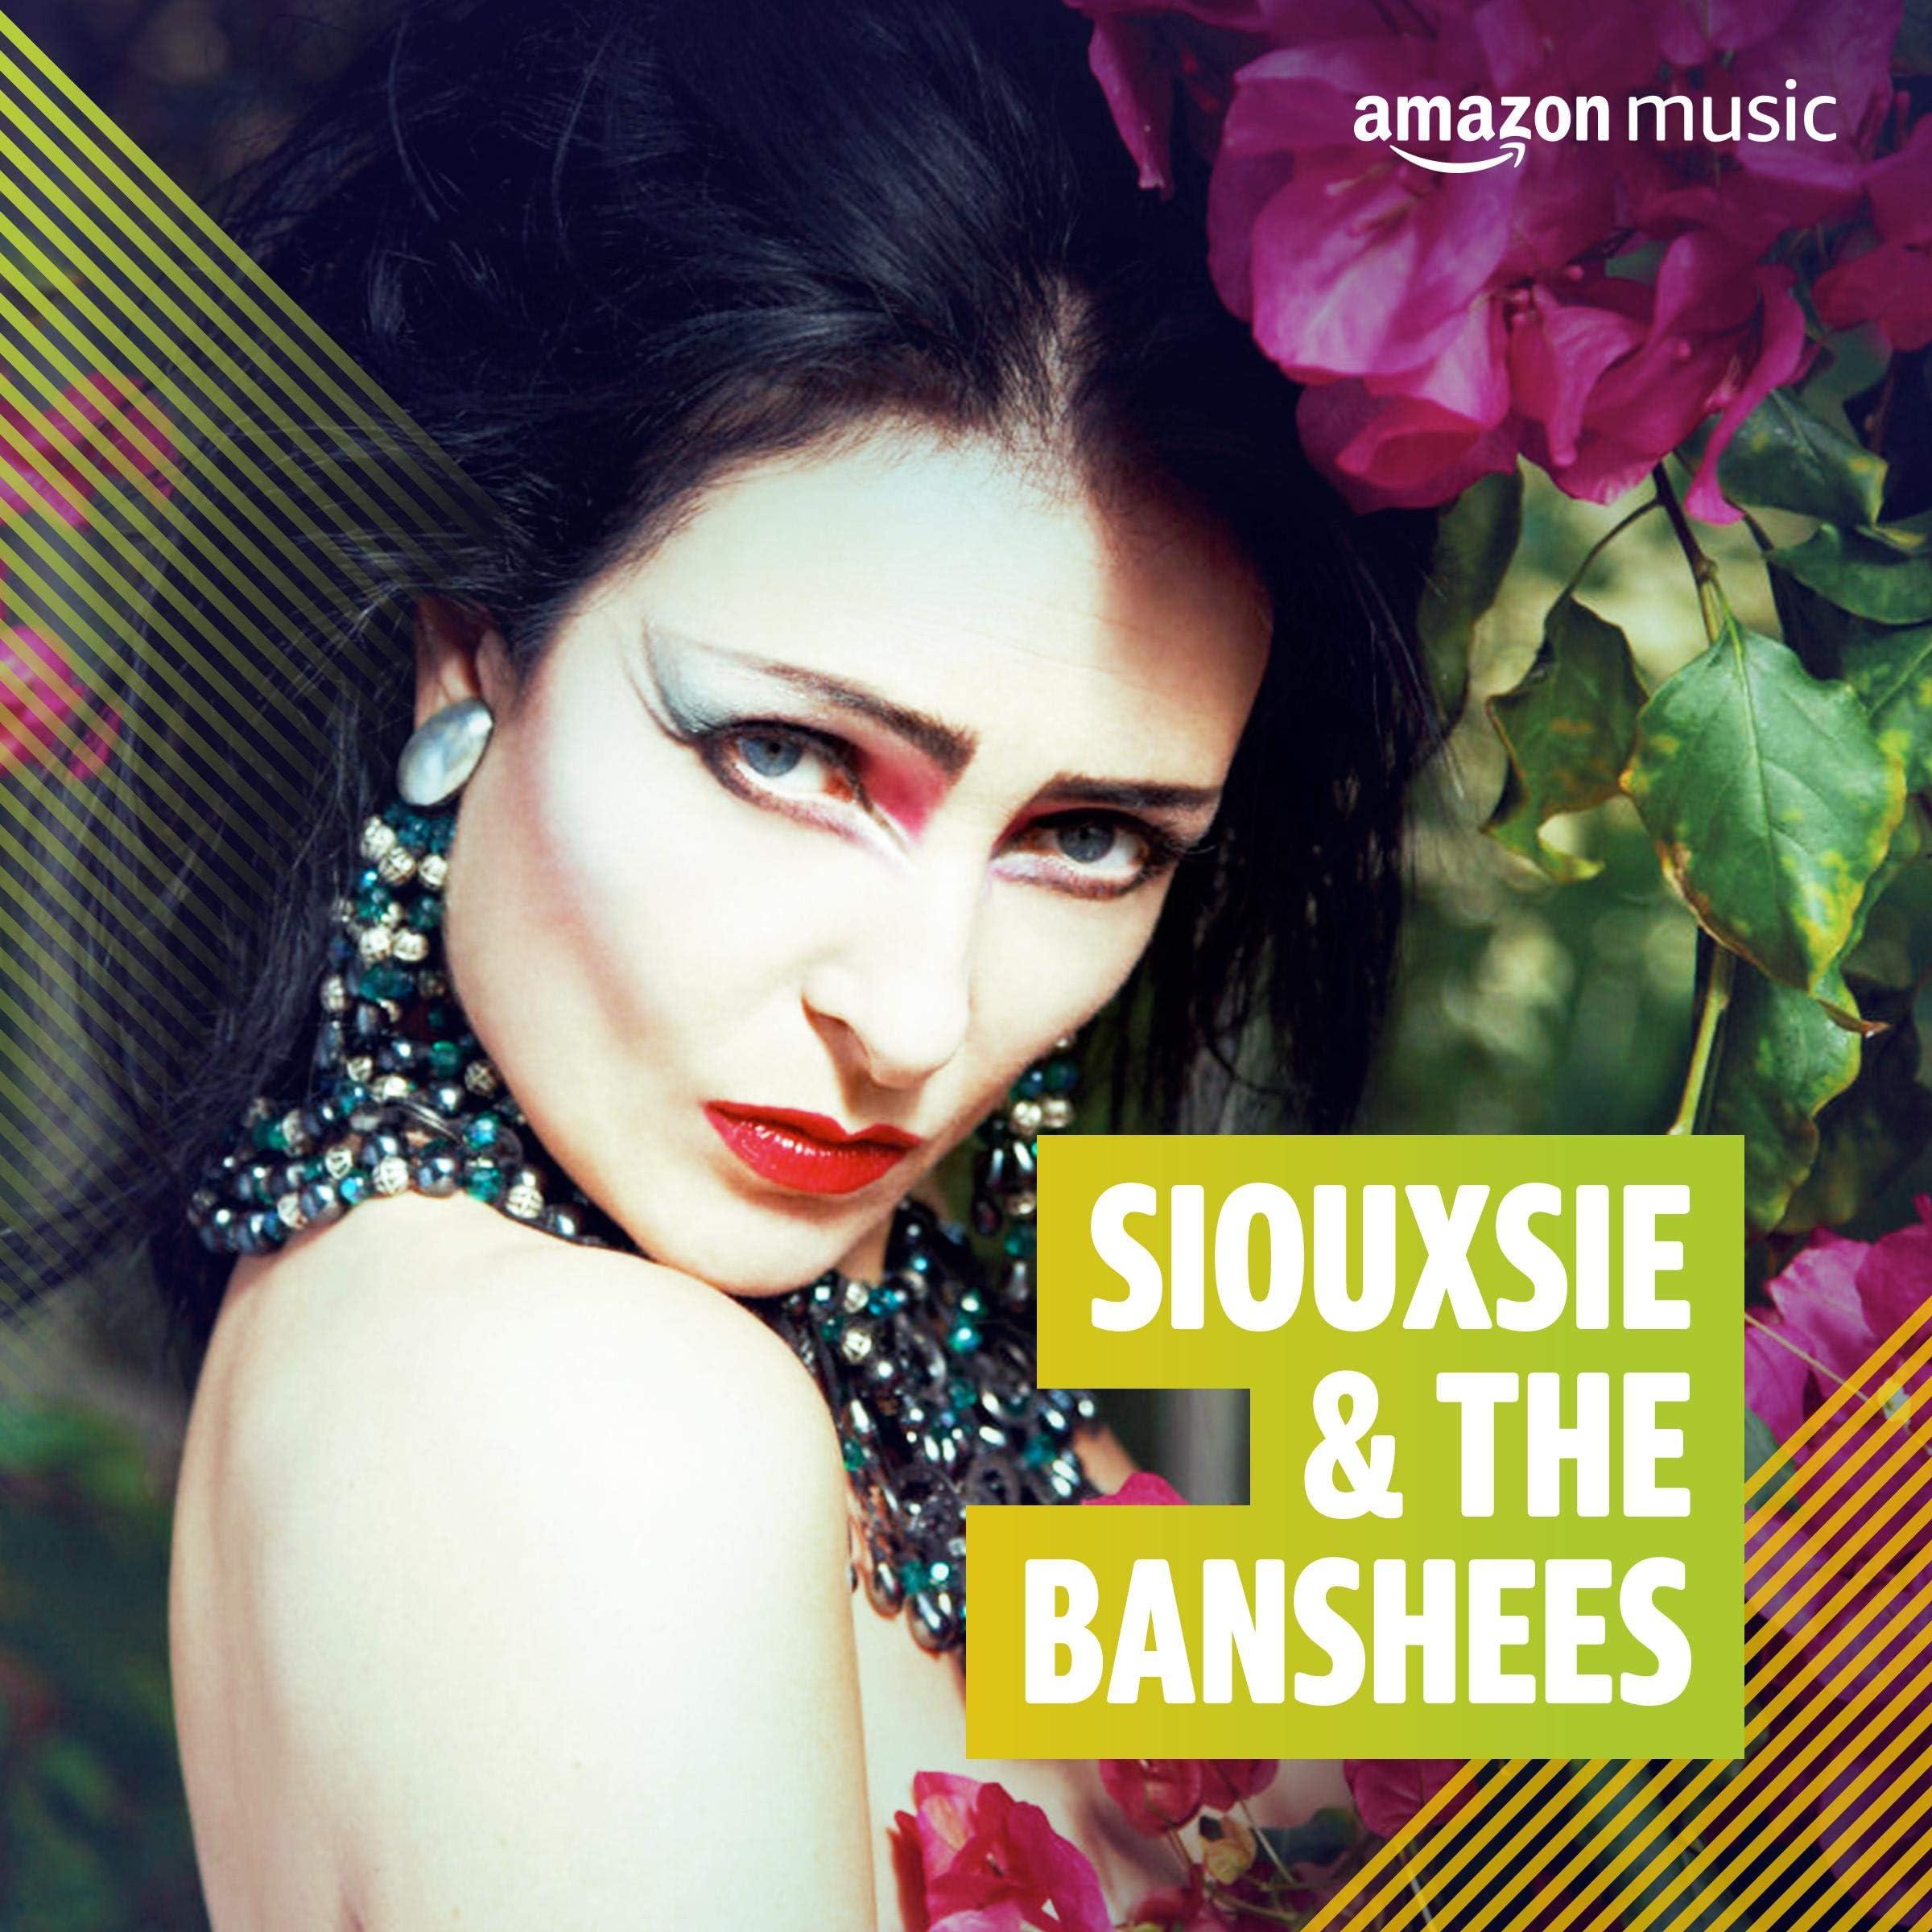 Siouxsie & The Banshees